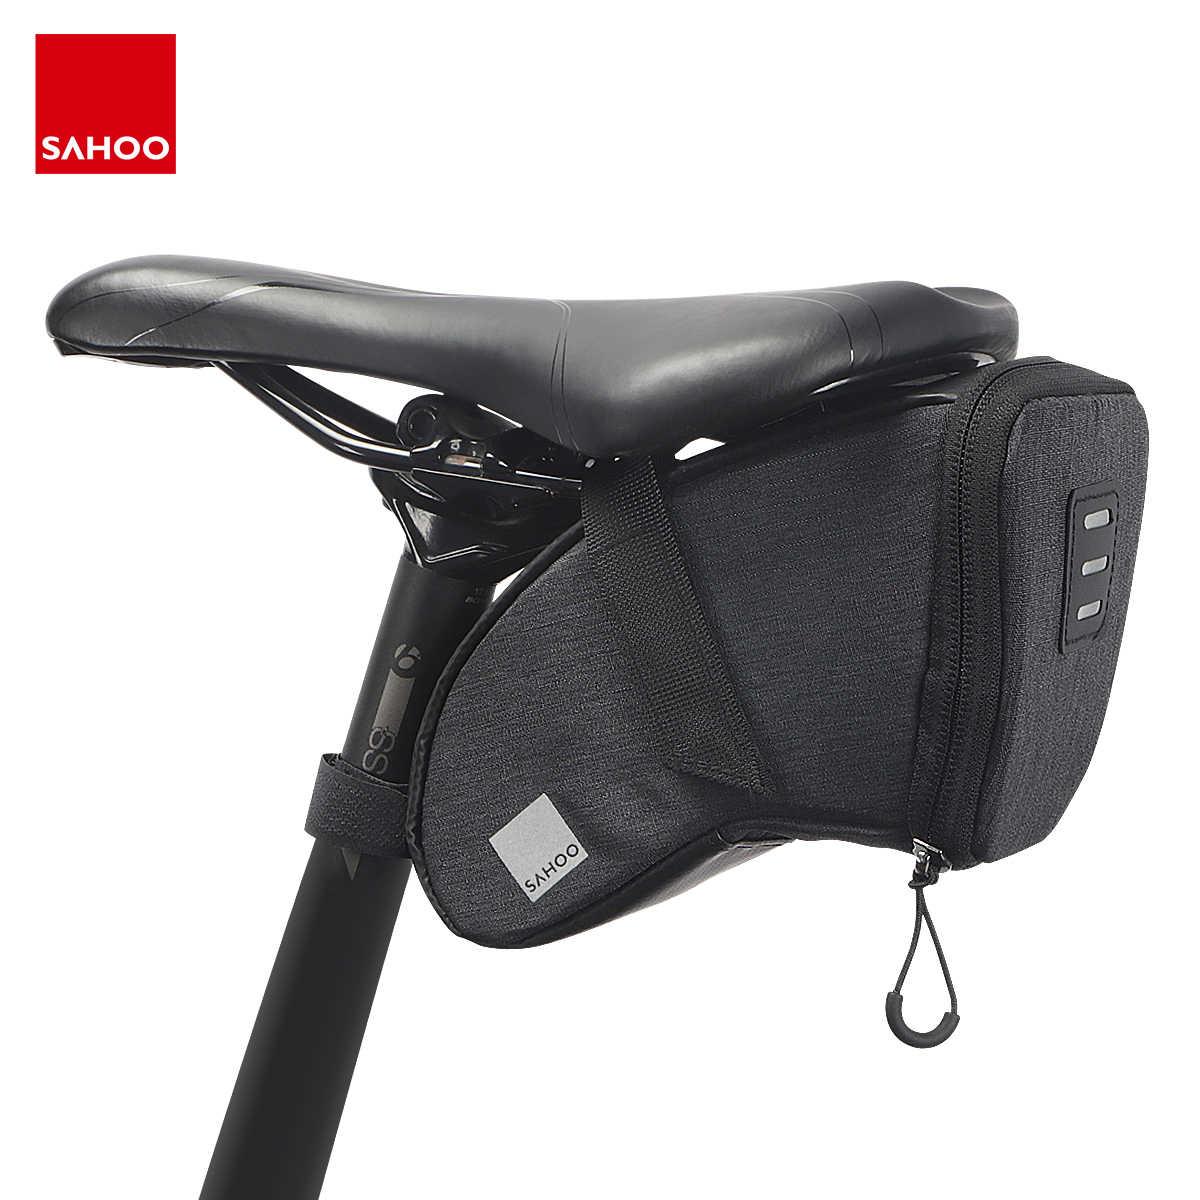 MTB Mountain Bike Bag Pouch Road Bicycle Cycling Seat Saddle Rear Bag Panniers